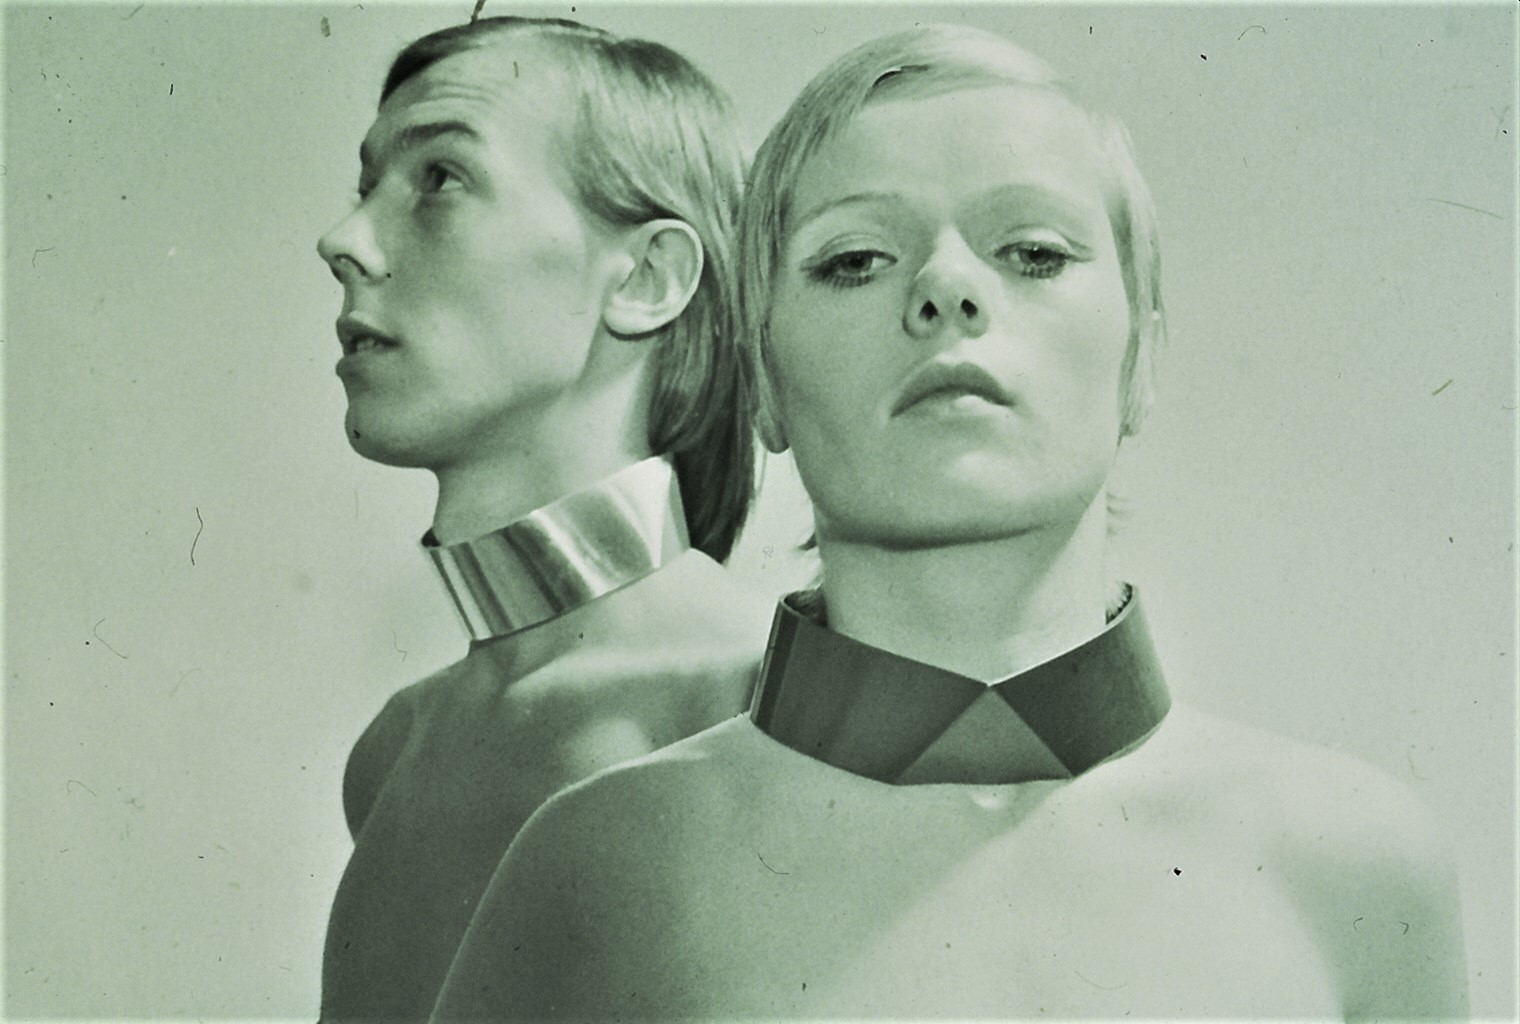 Gijs Bakker, halssieraden, 1976. Foto Mathilde Jurissen